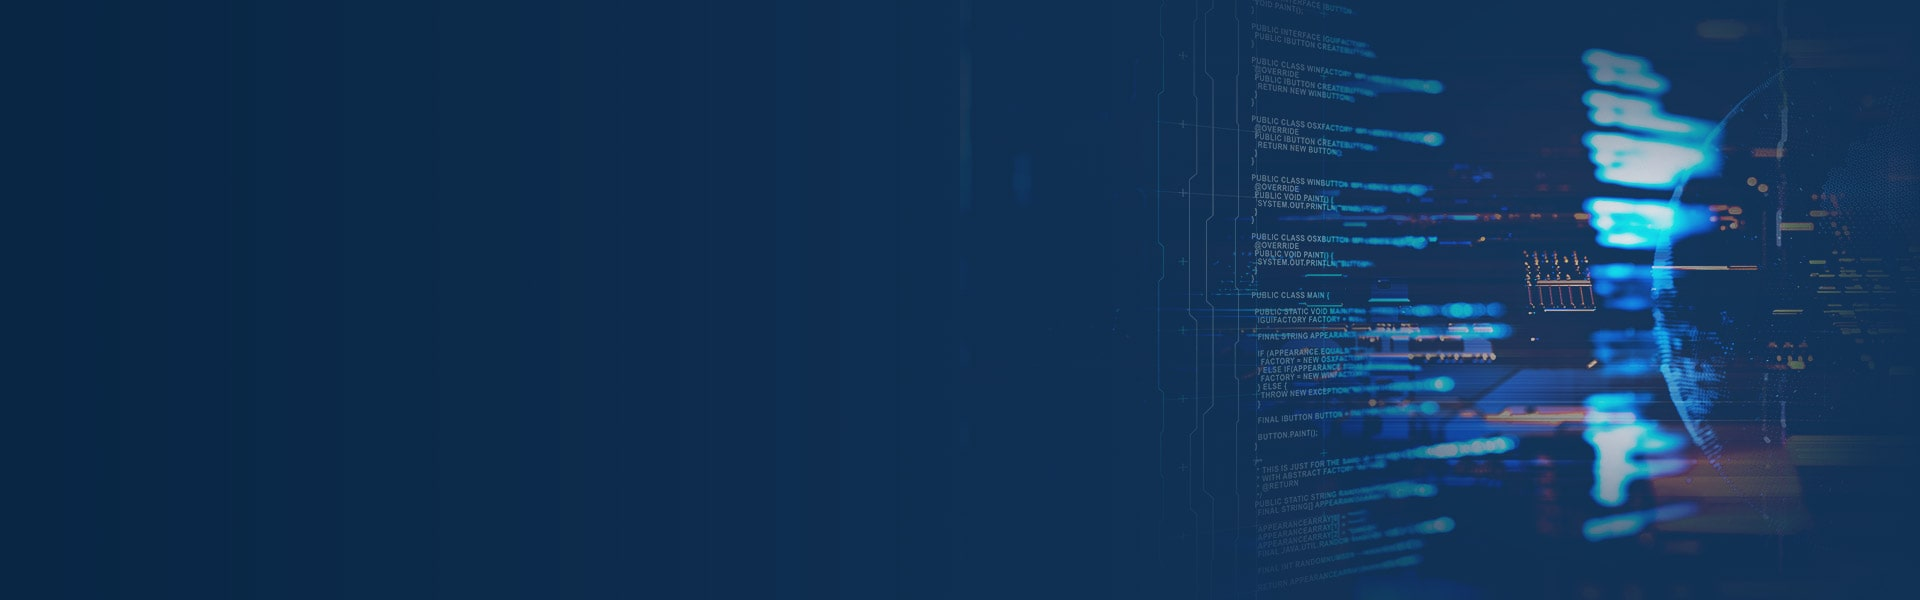 NovaStor Backup-Lösung Archivierung